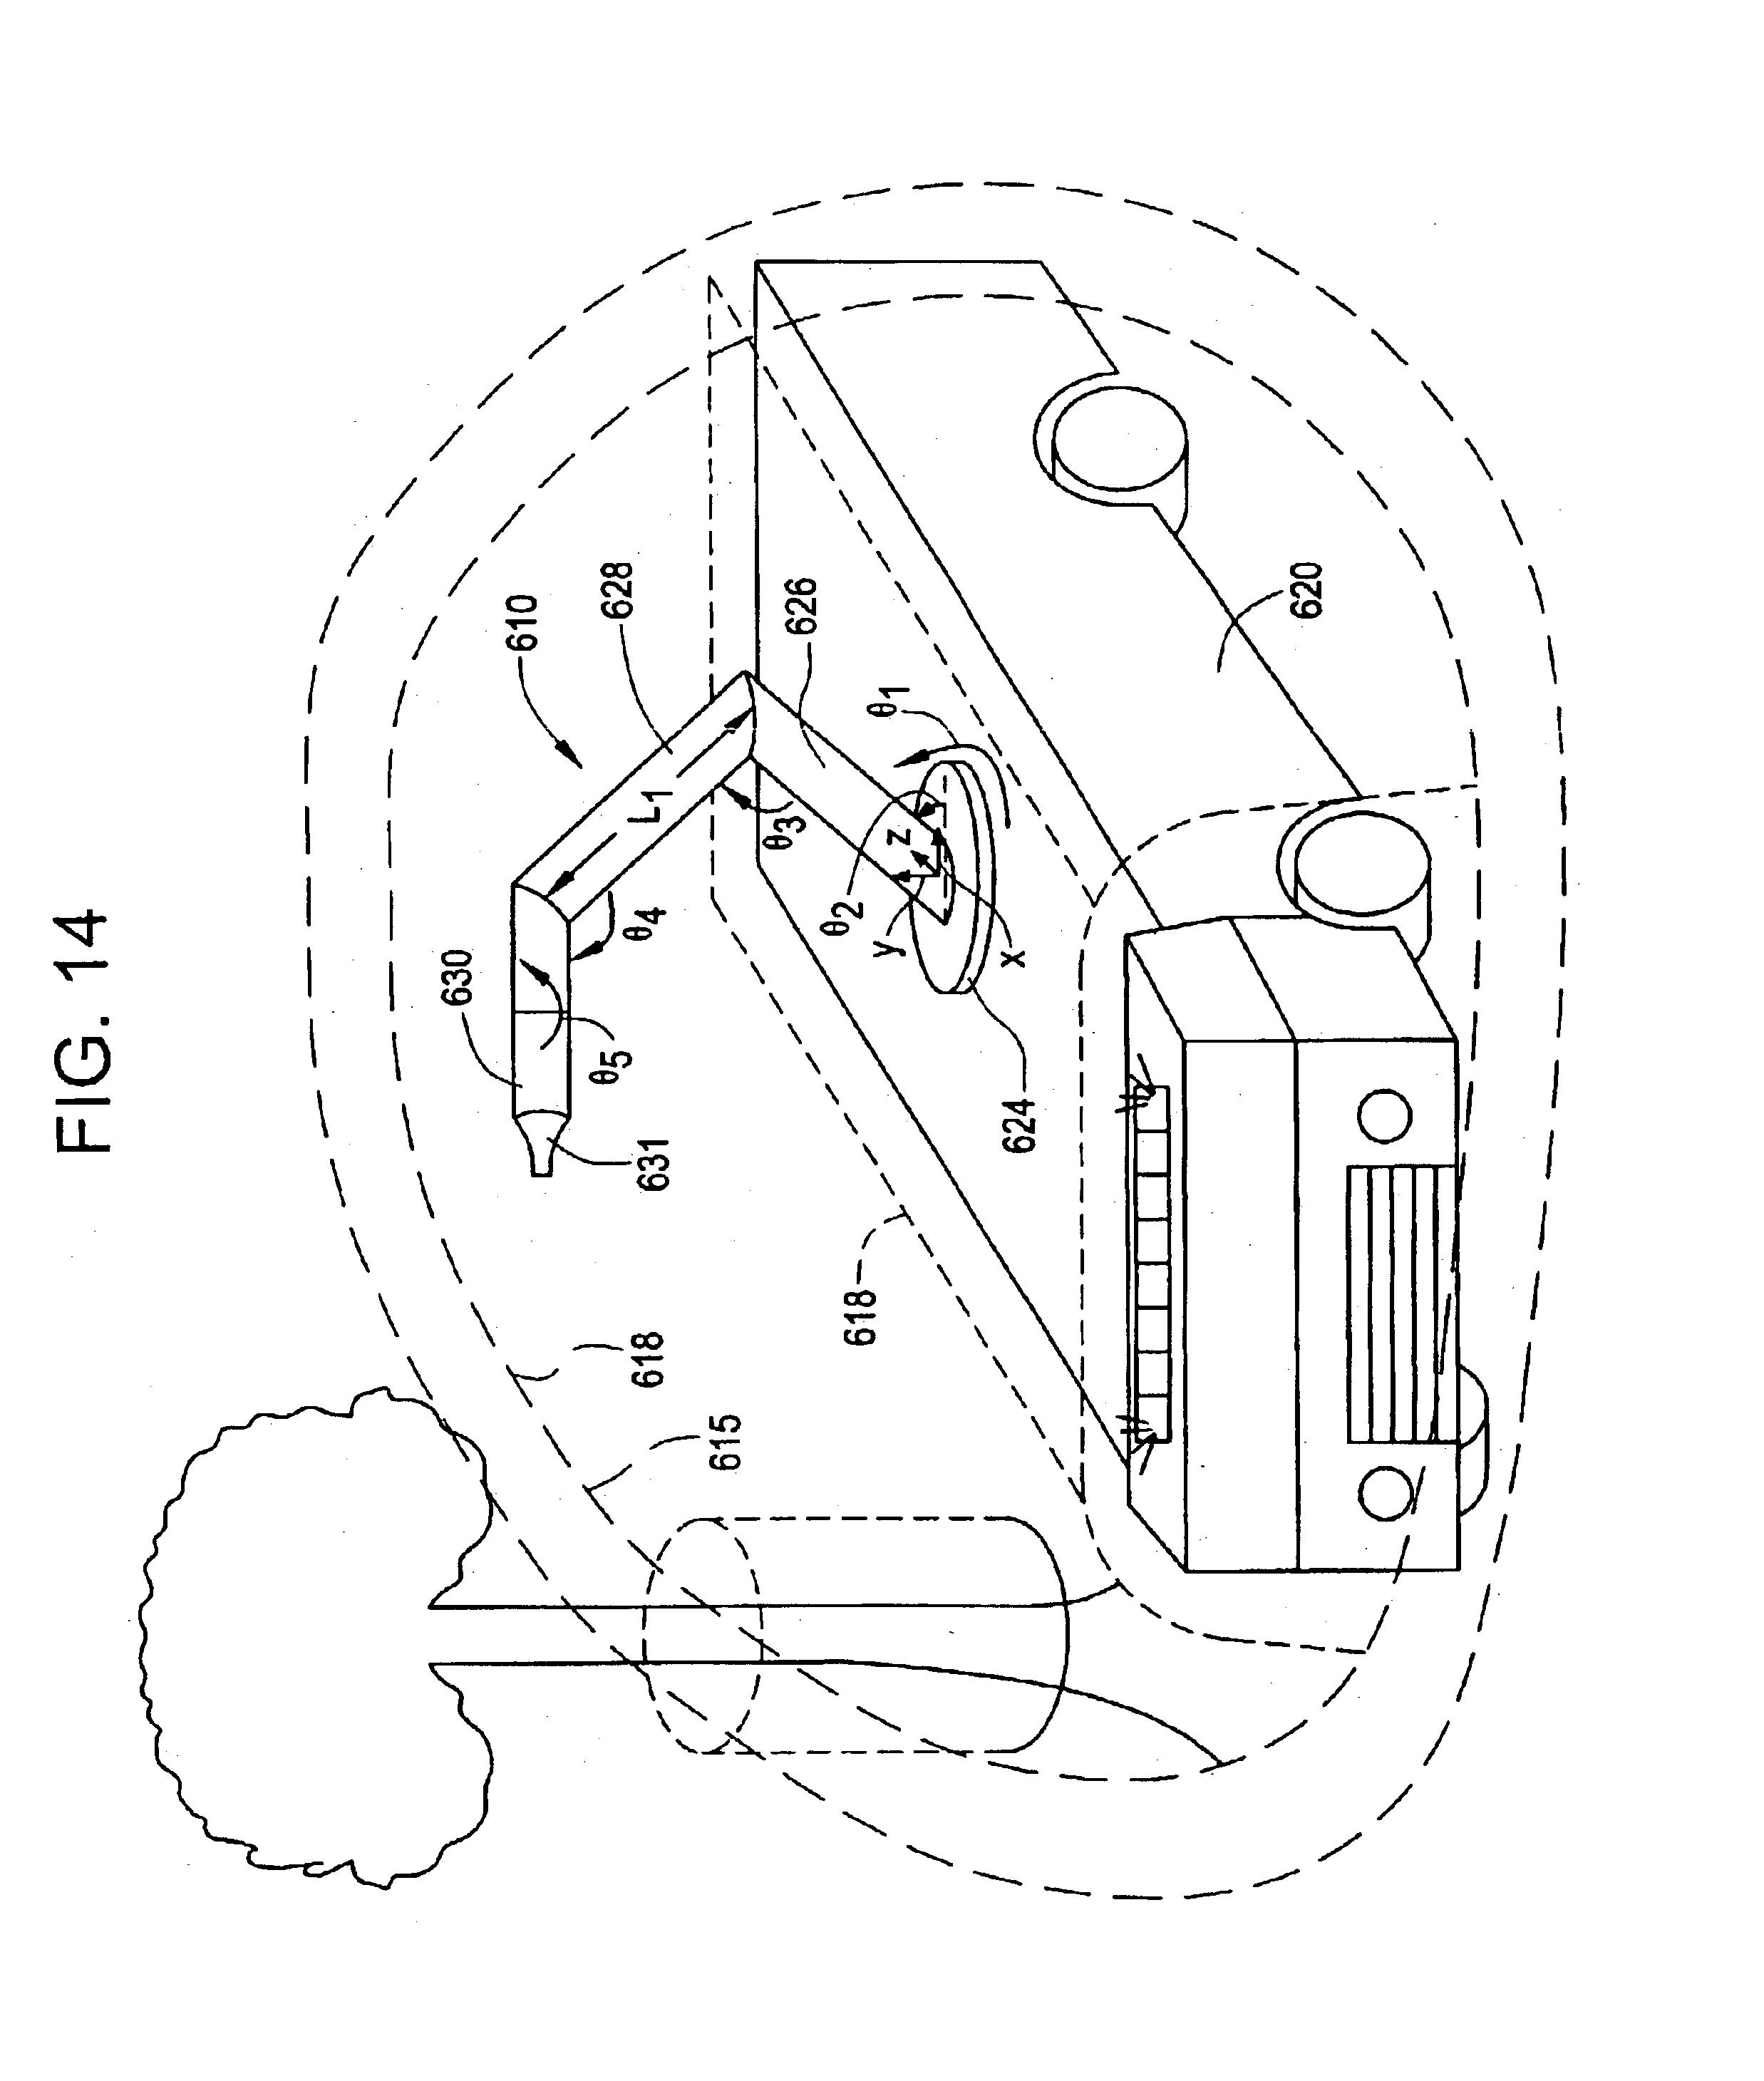 federal siren wiring diagram federal pa300 siren wiring diagram federal  siren pa300 wiring diagram wiring diagrams